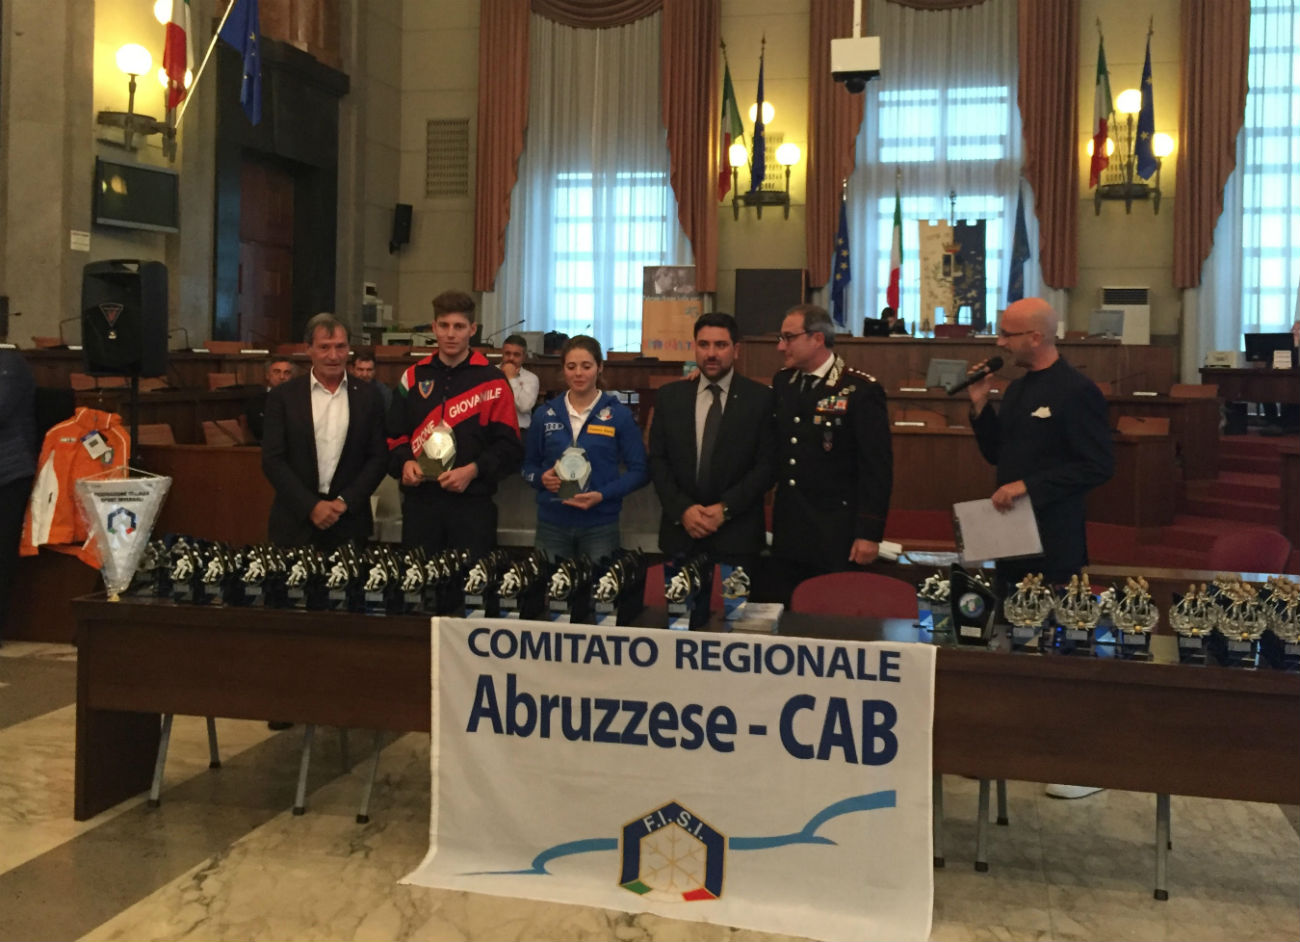 Pescara Camera Live : Live webcams in abruzzo italy